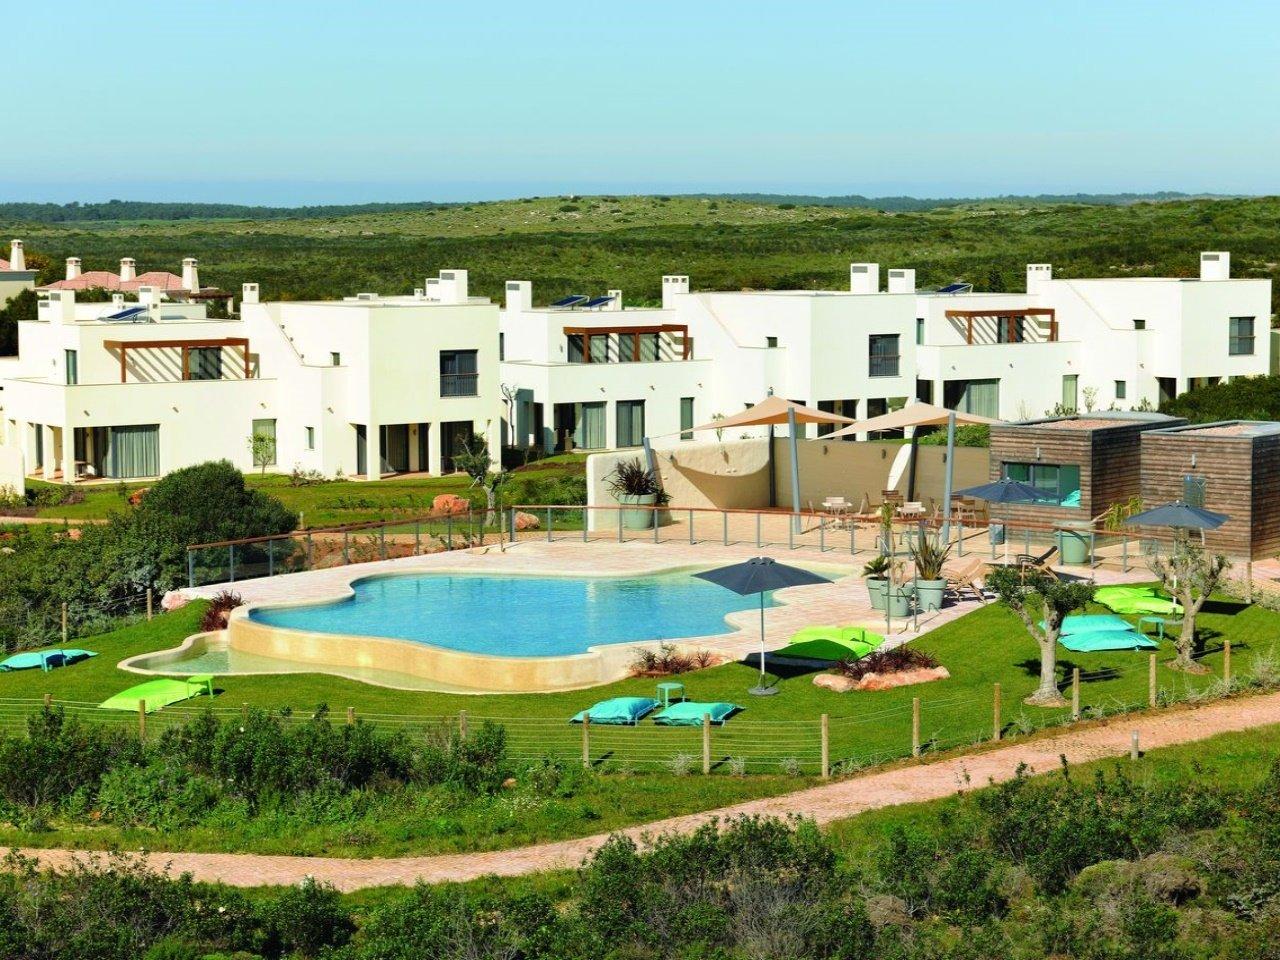 1 Bedroom Townhouse Sagres, Western Algarve Ref: AVA52